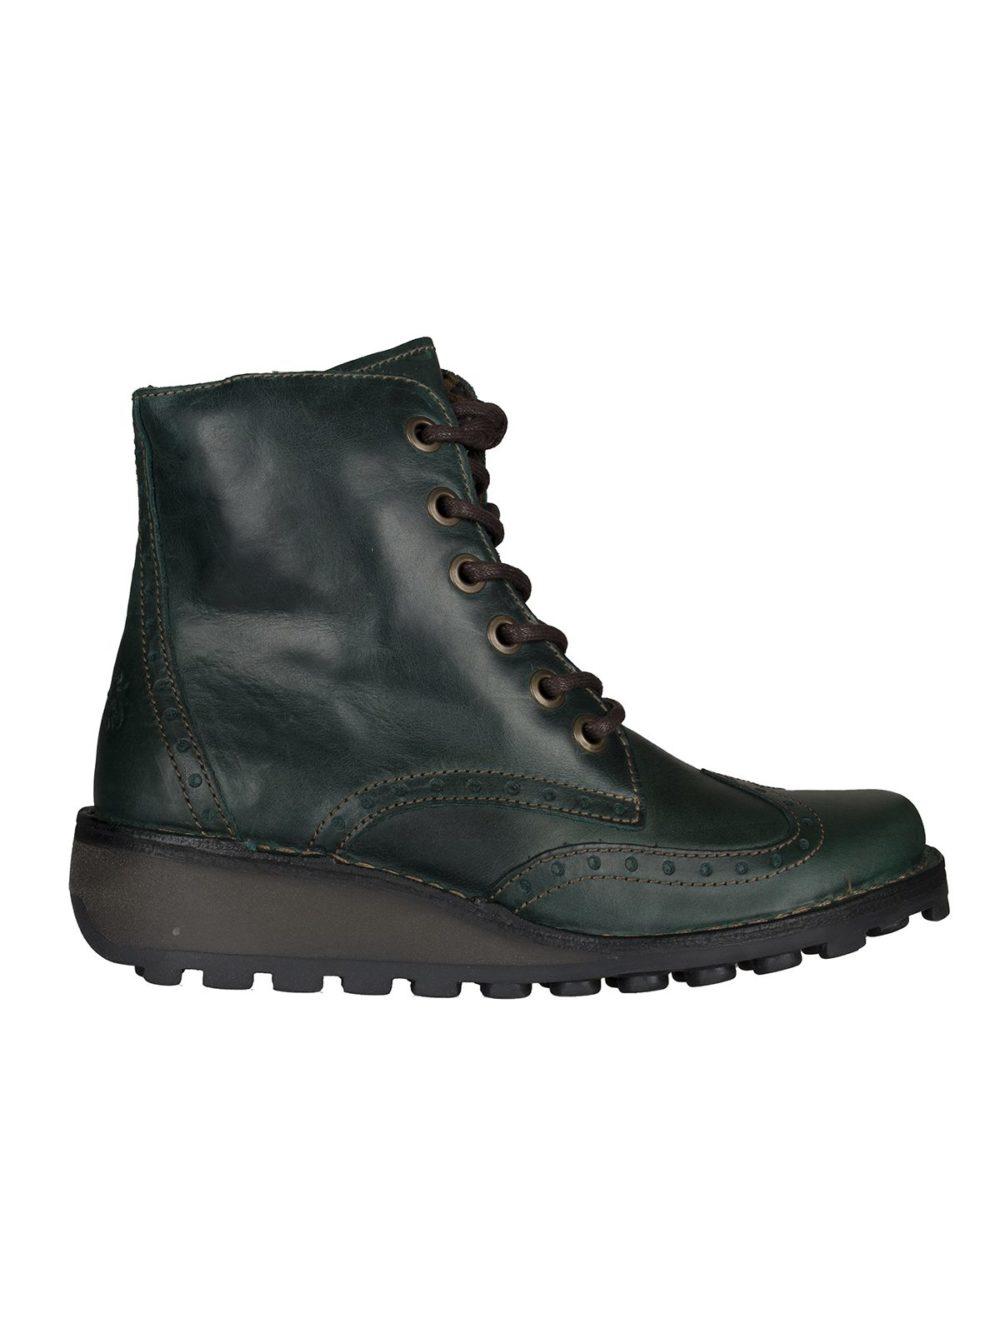 Marl Boot